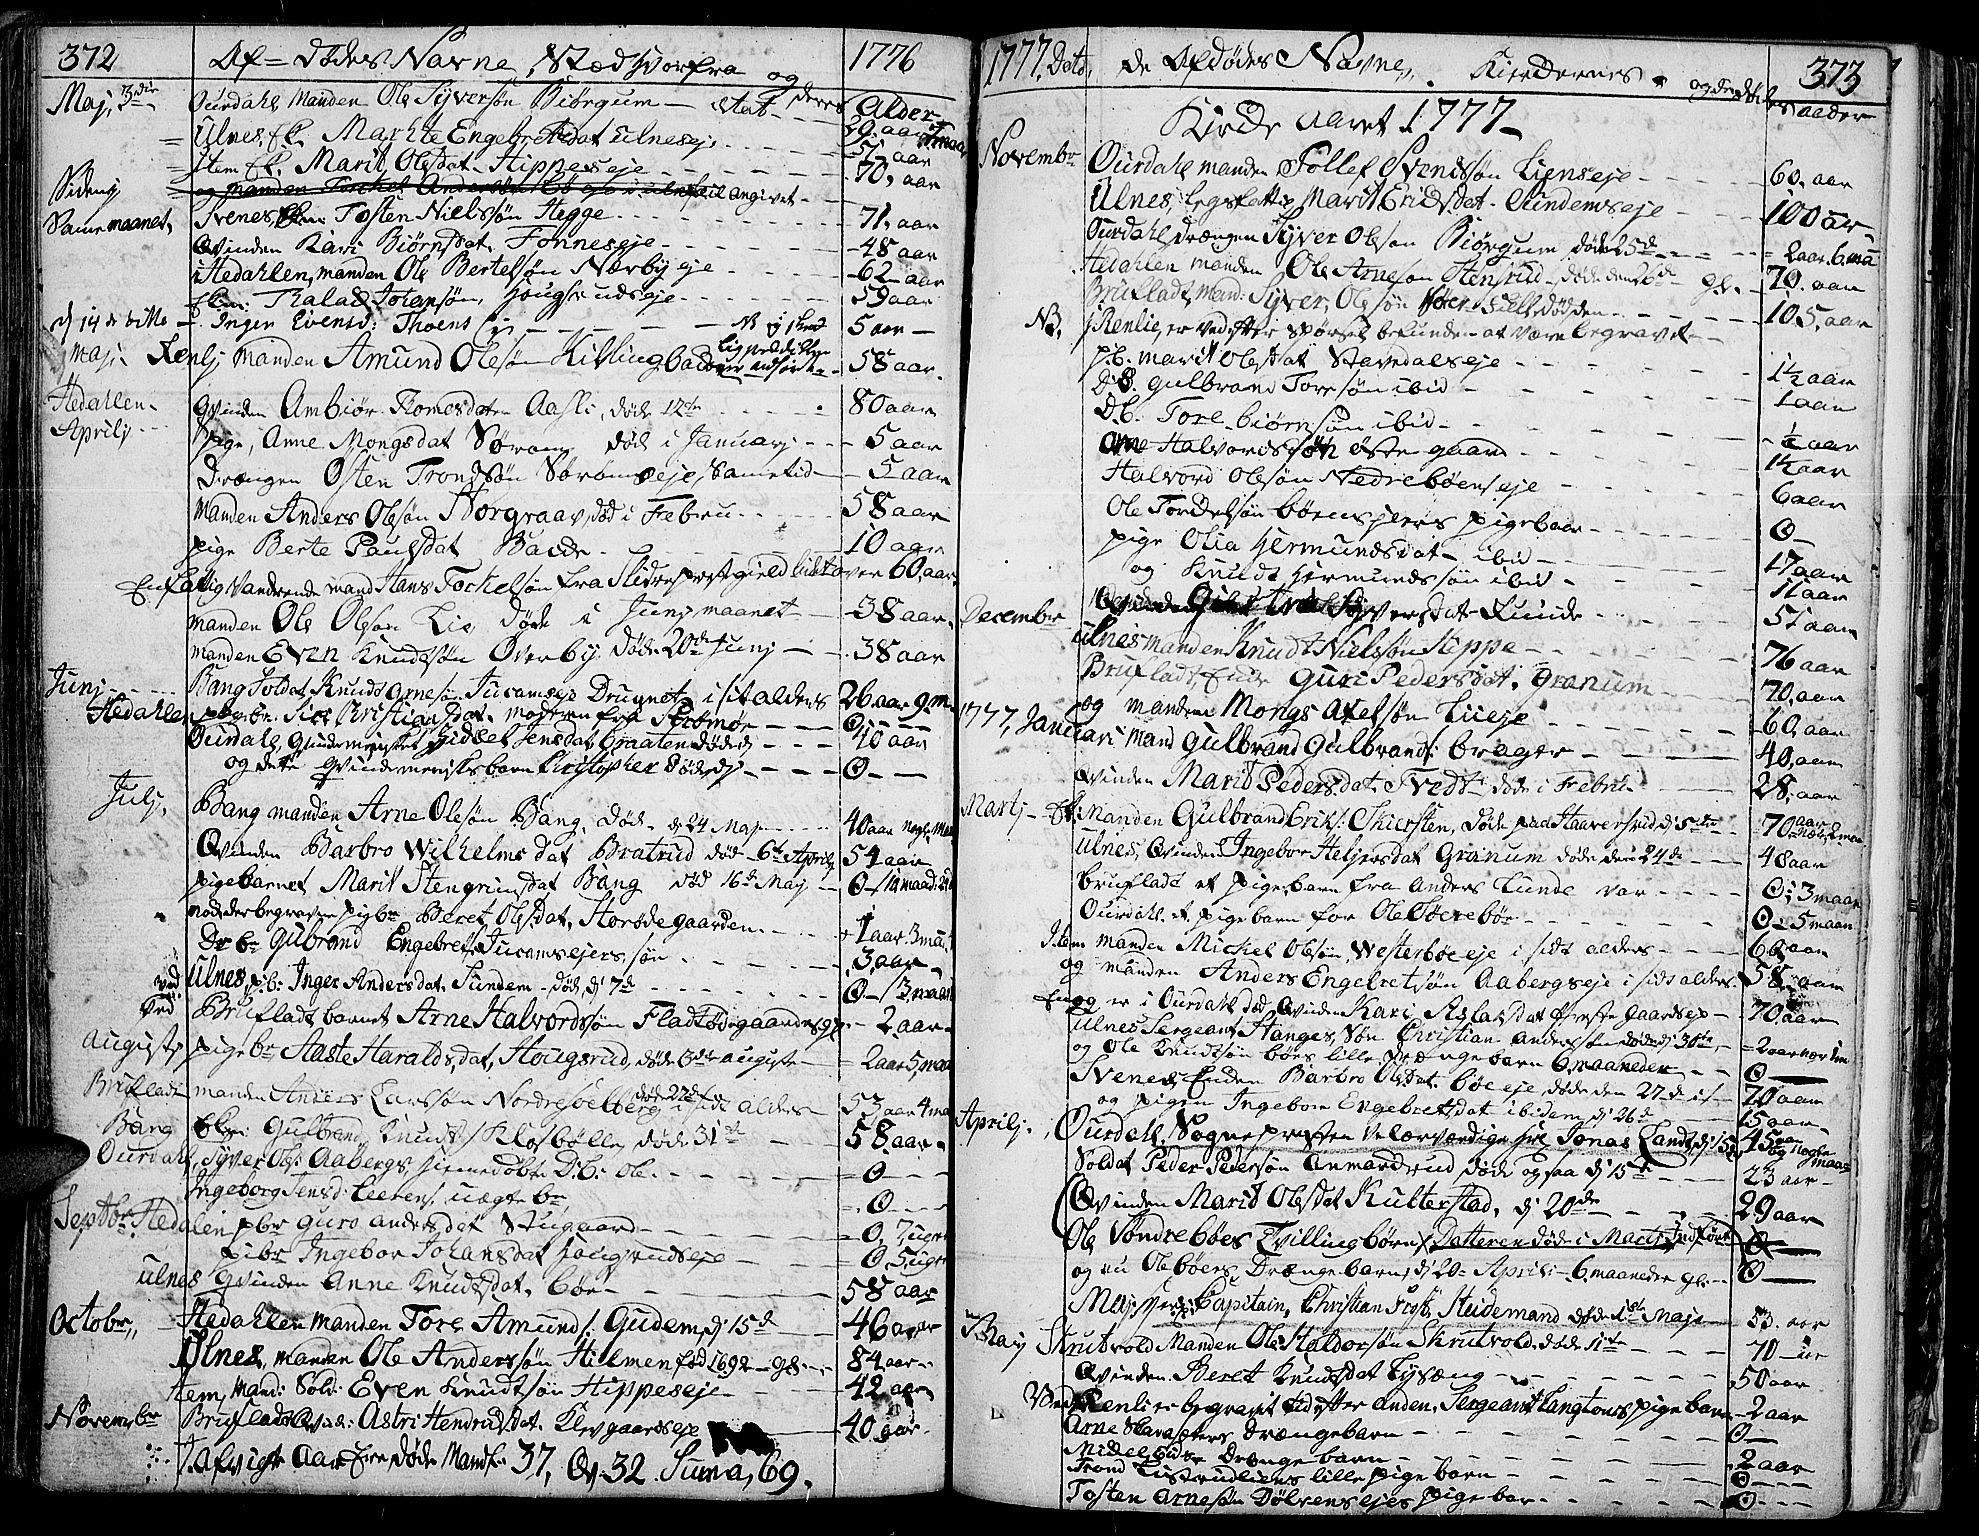 SAH, Aurdal prestekontor, Ministerialbok nr. 5, 1763-1781, s. 372-373